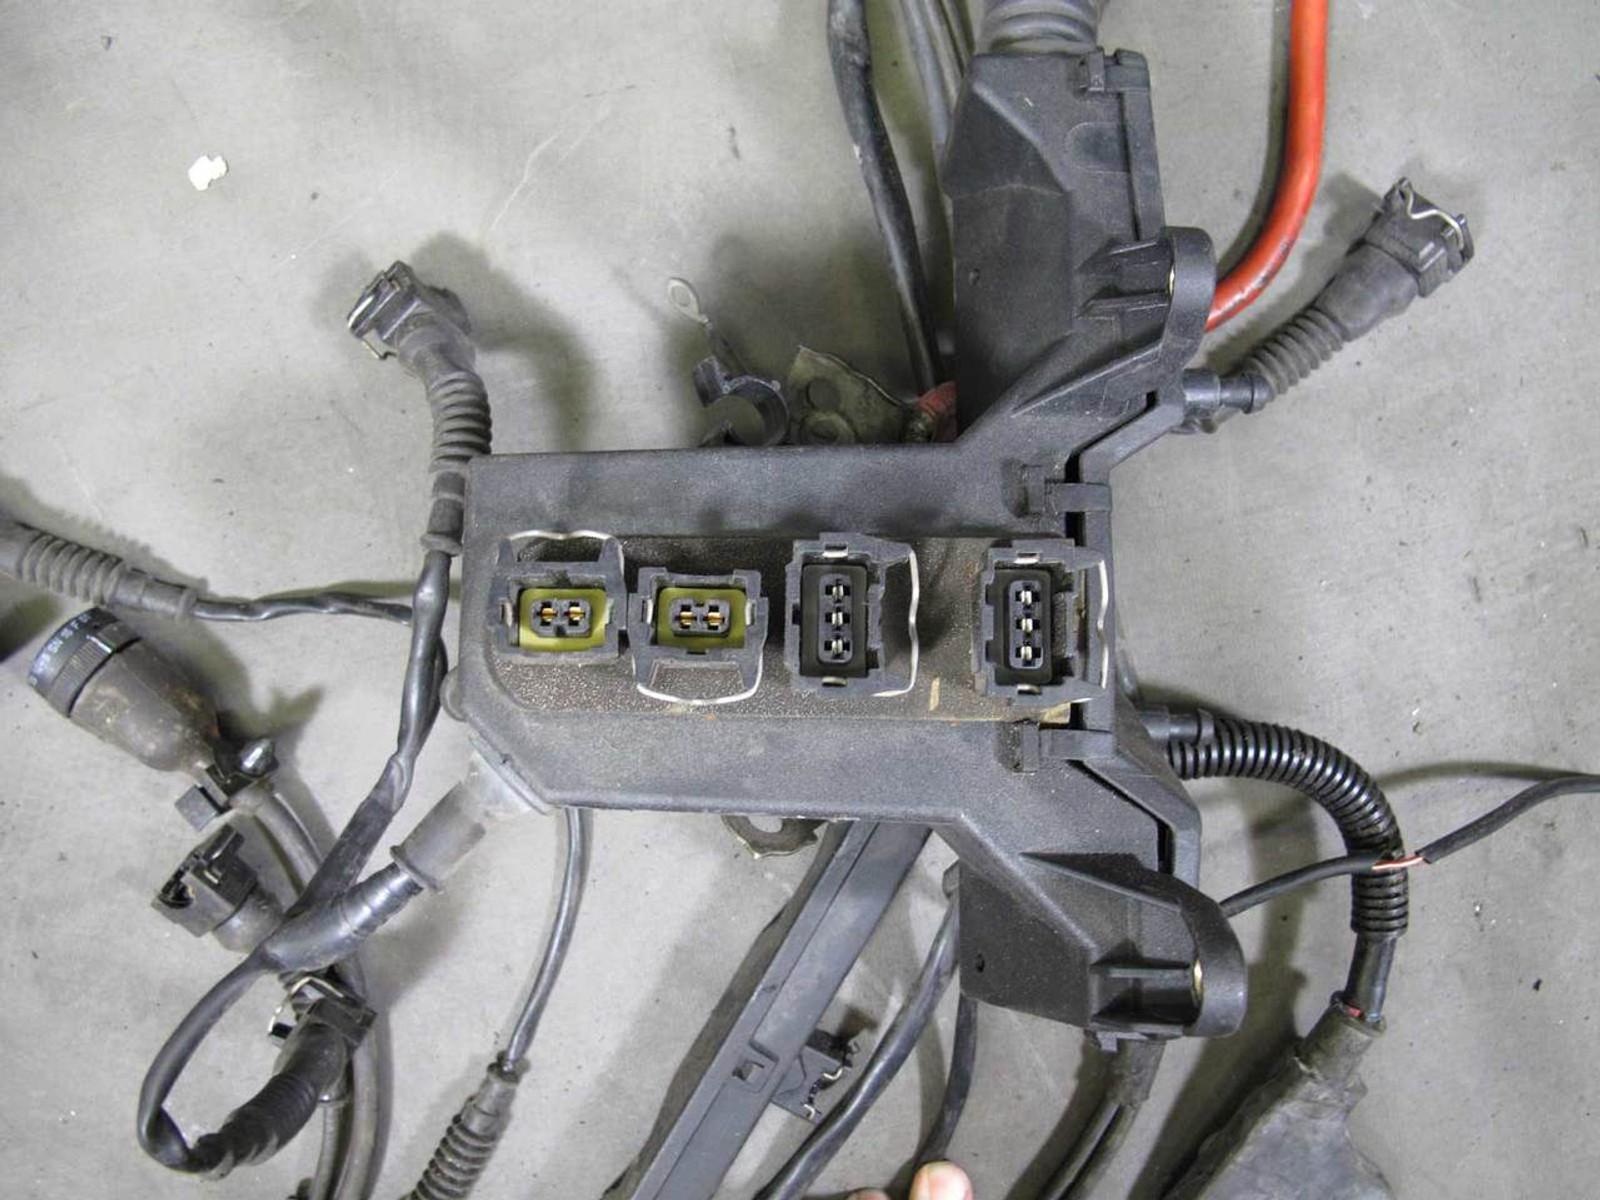 hight resolution of 1995 bmw wiring harness wiring diagram 1995 bmw 525i engine wiring harness 1995 bmw e36 318i